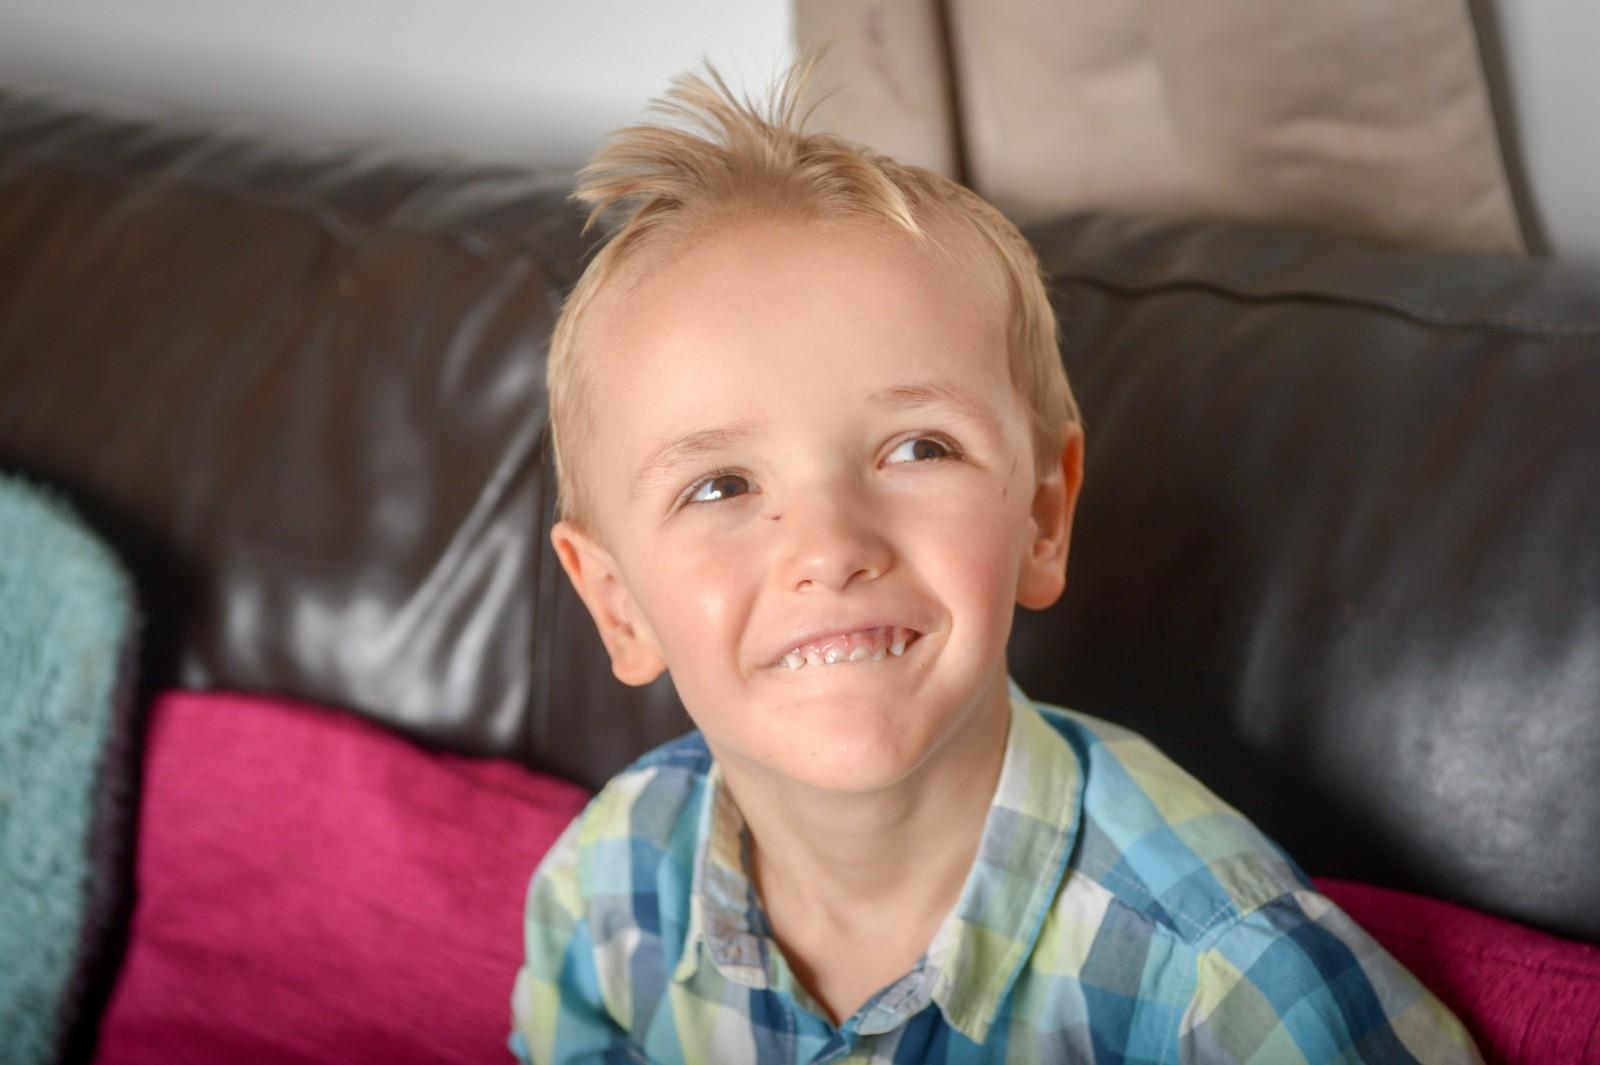 The three-year-old boy who is already FOUR-FEET tall!